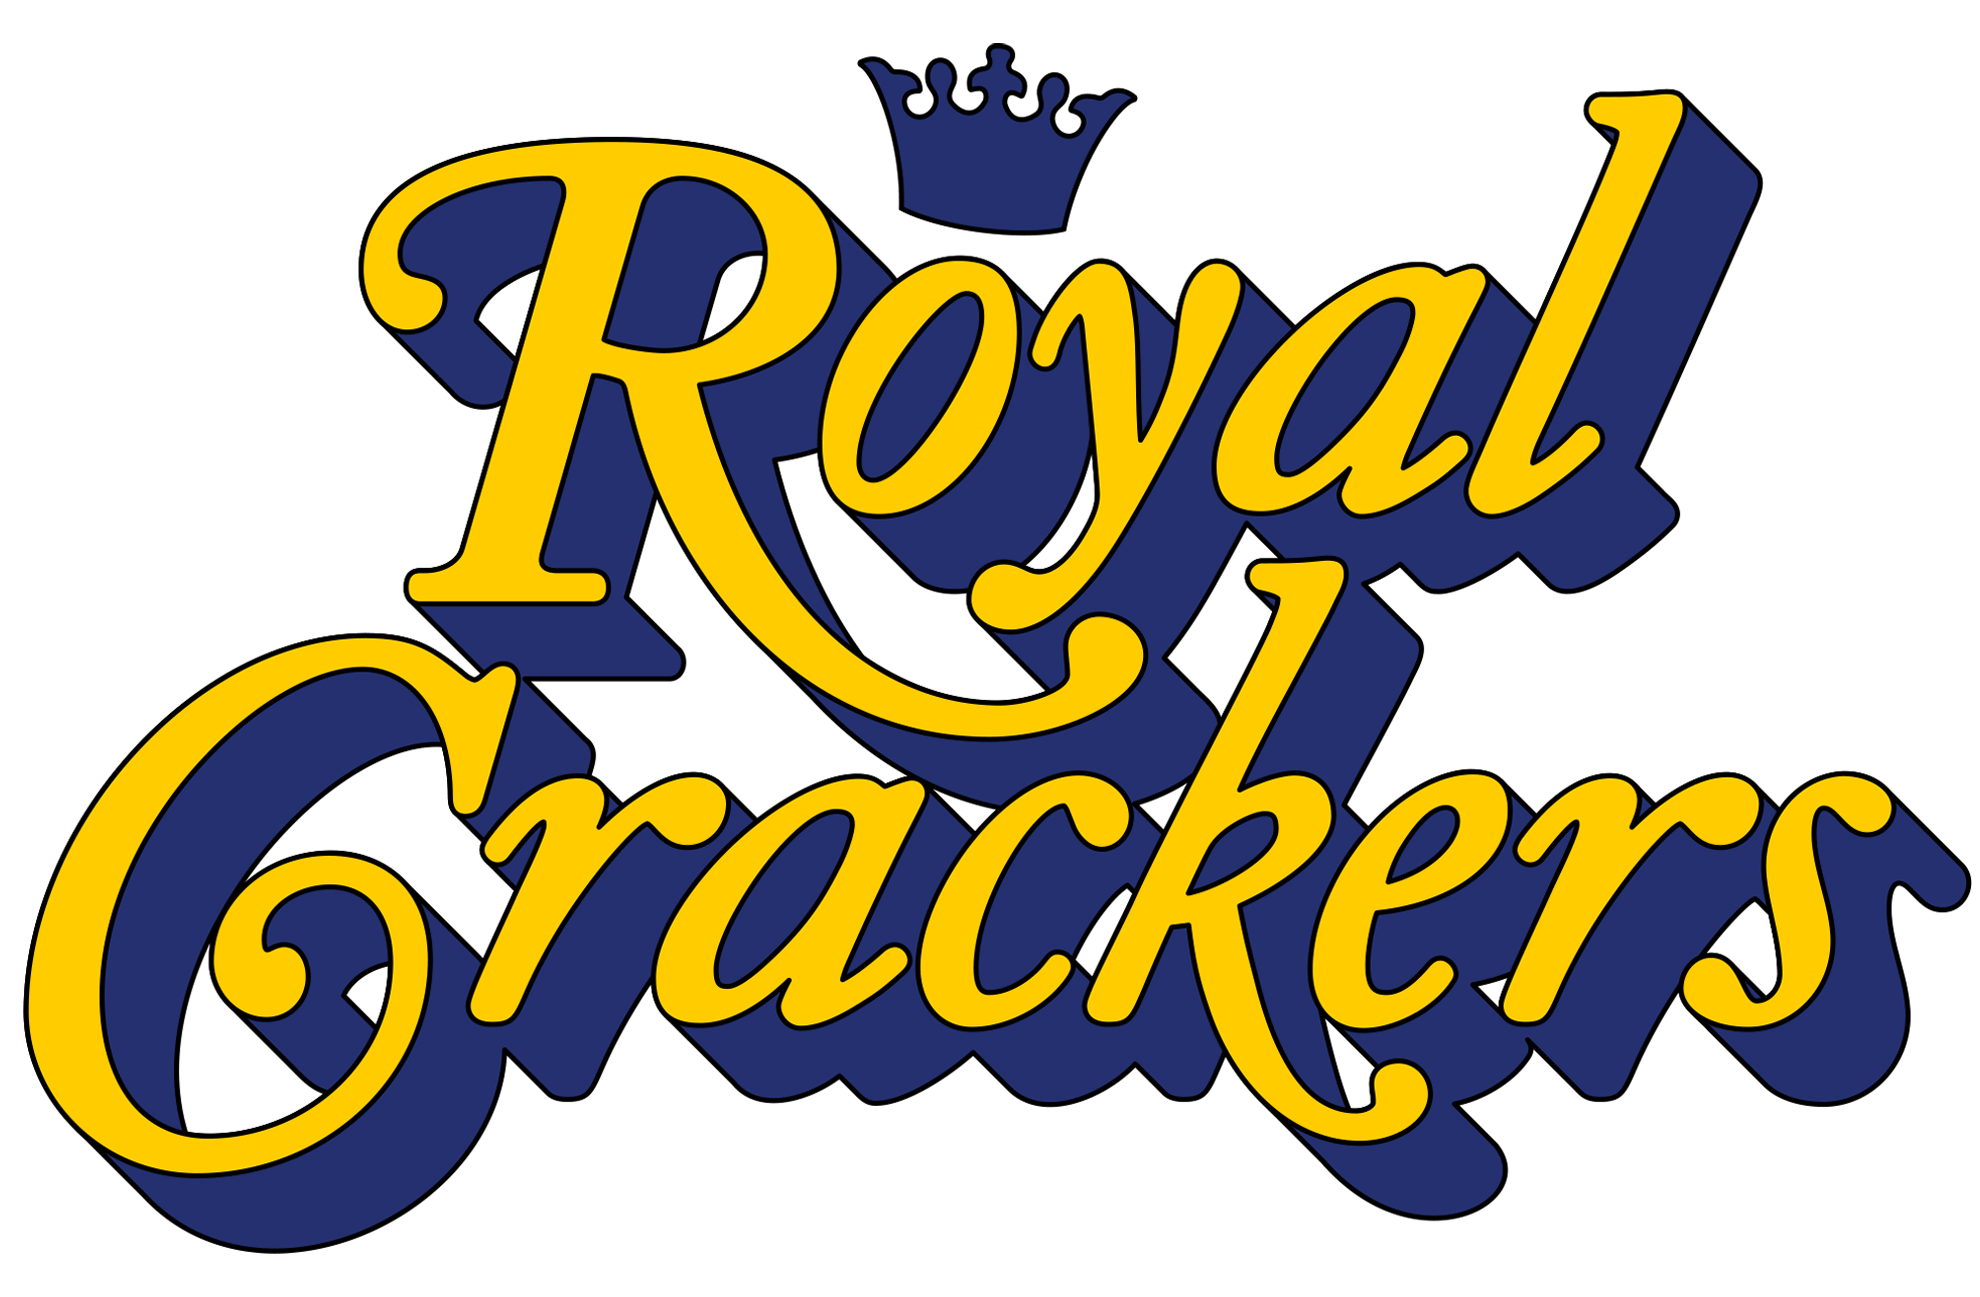 Royal Crackers - image